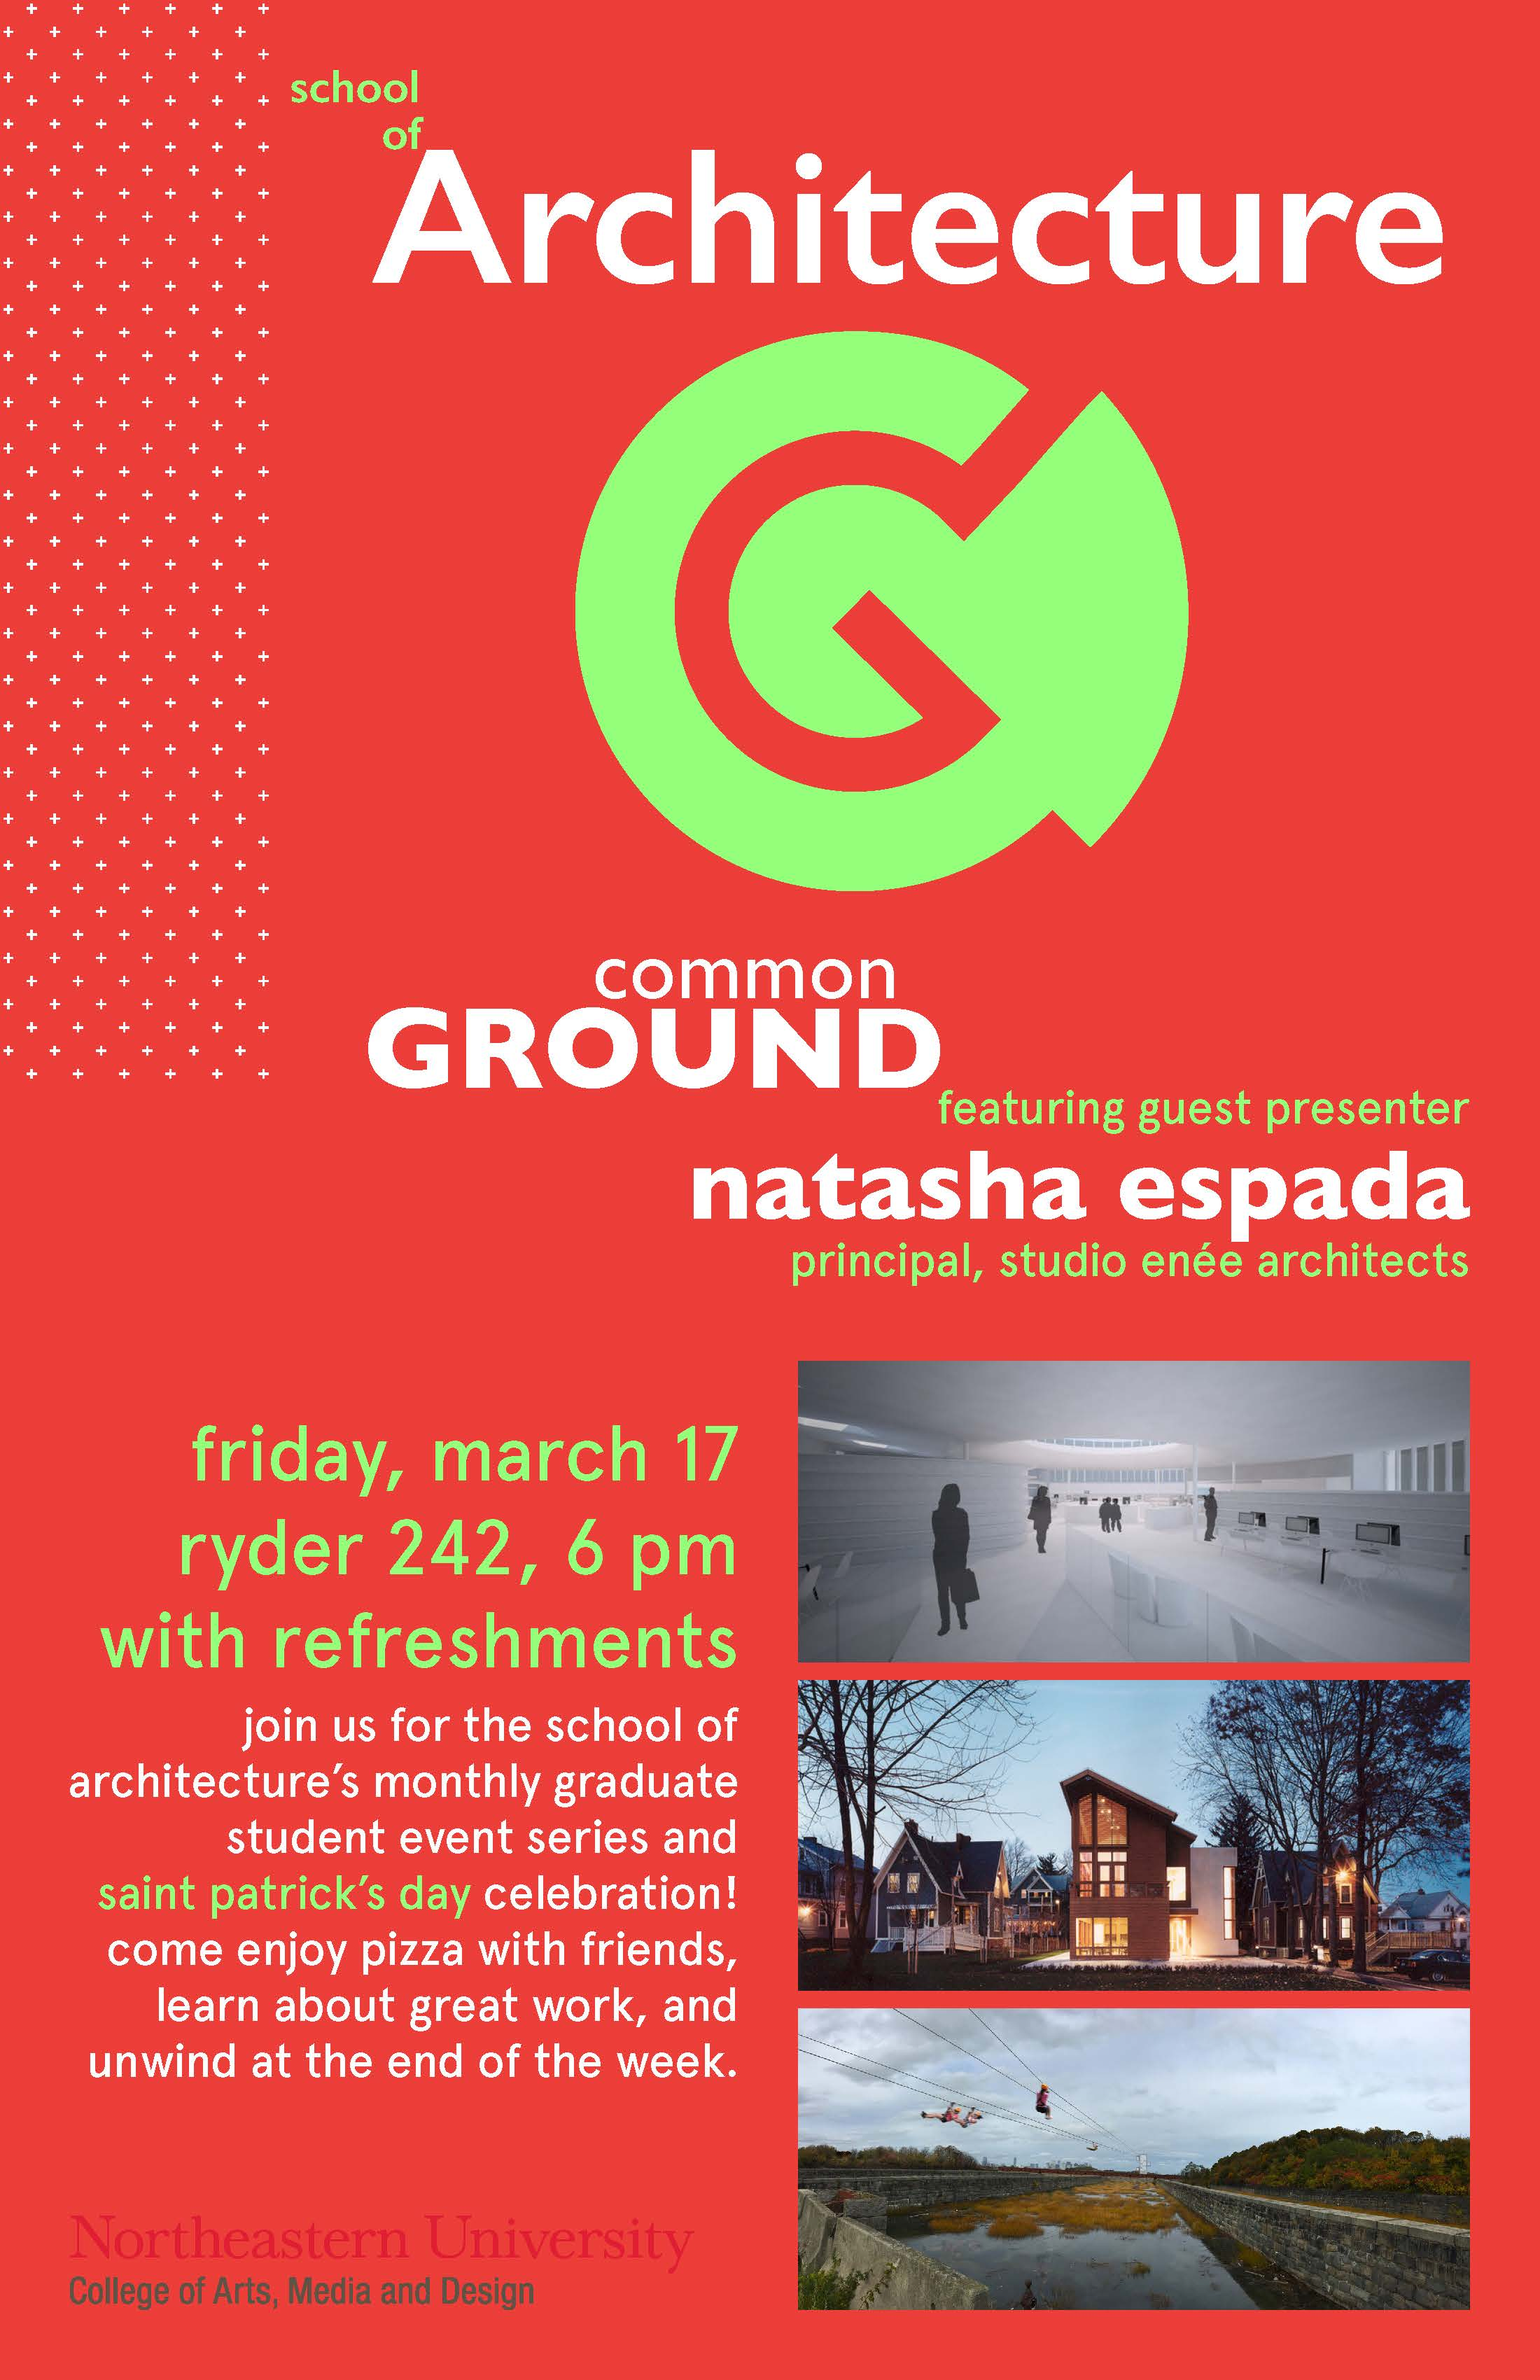 Natasha Espada Poster 3_17.jpg